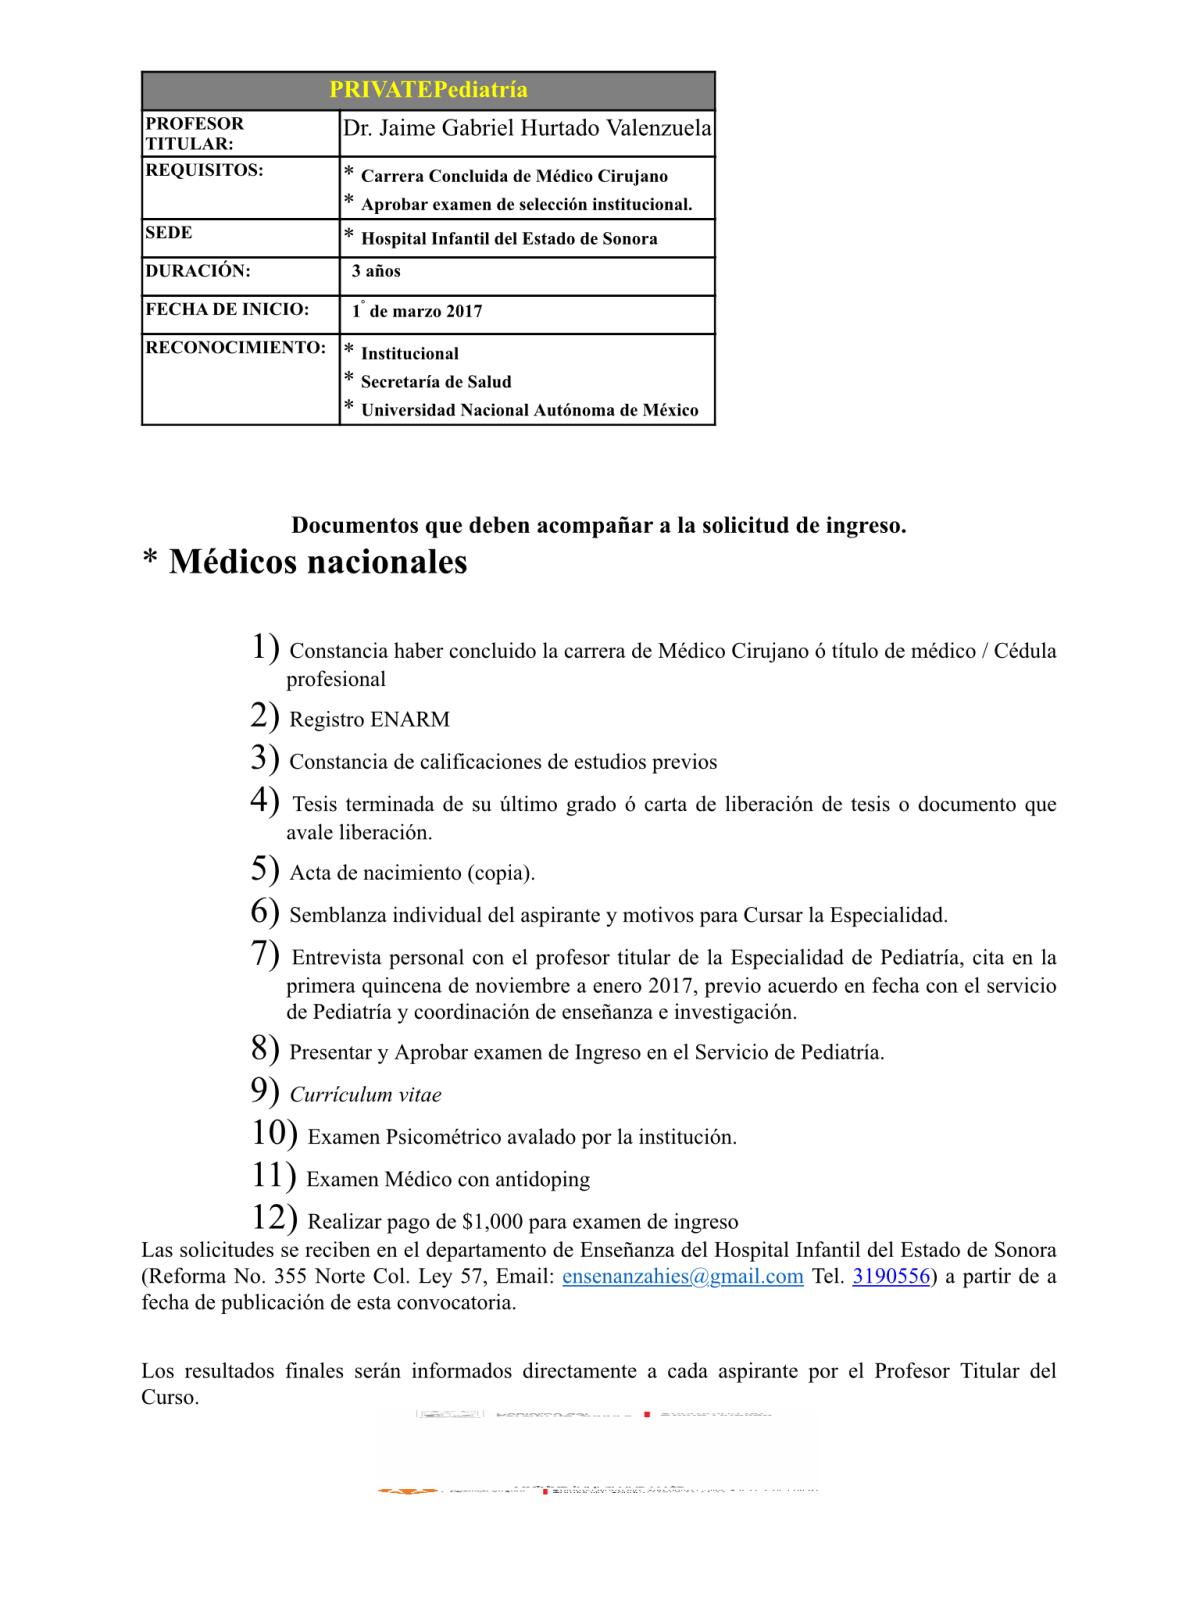 Hospital Infantil del Estado de Sonora. 289lkeb